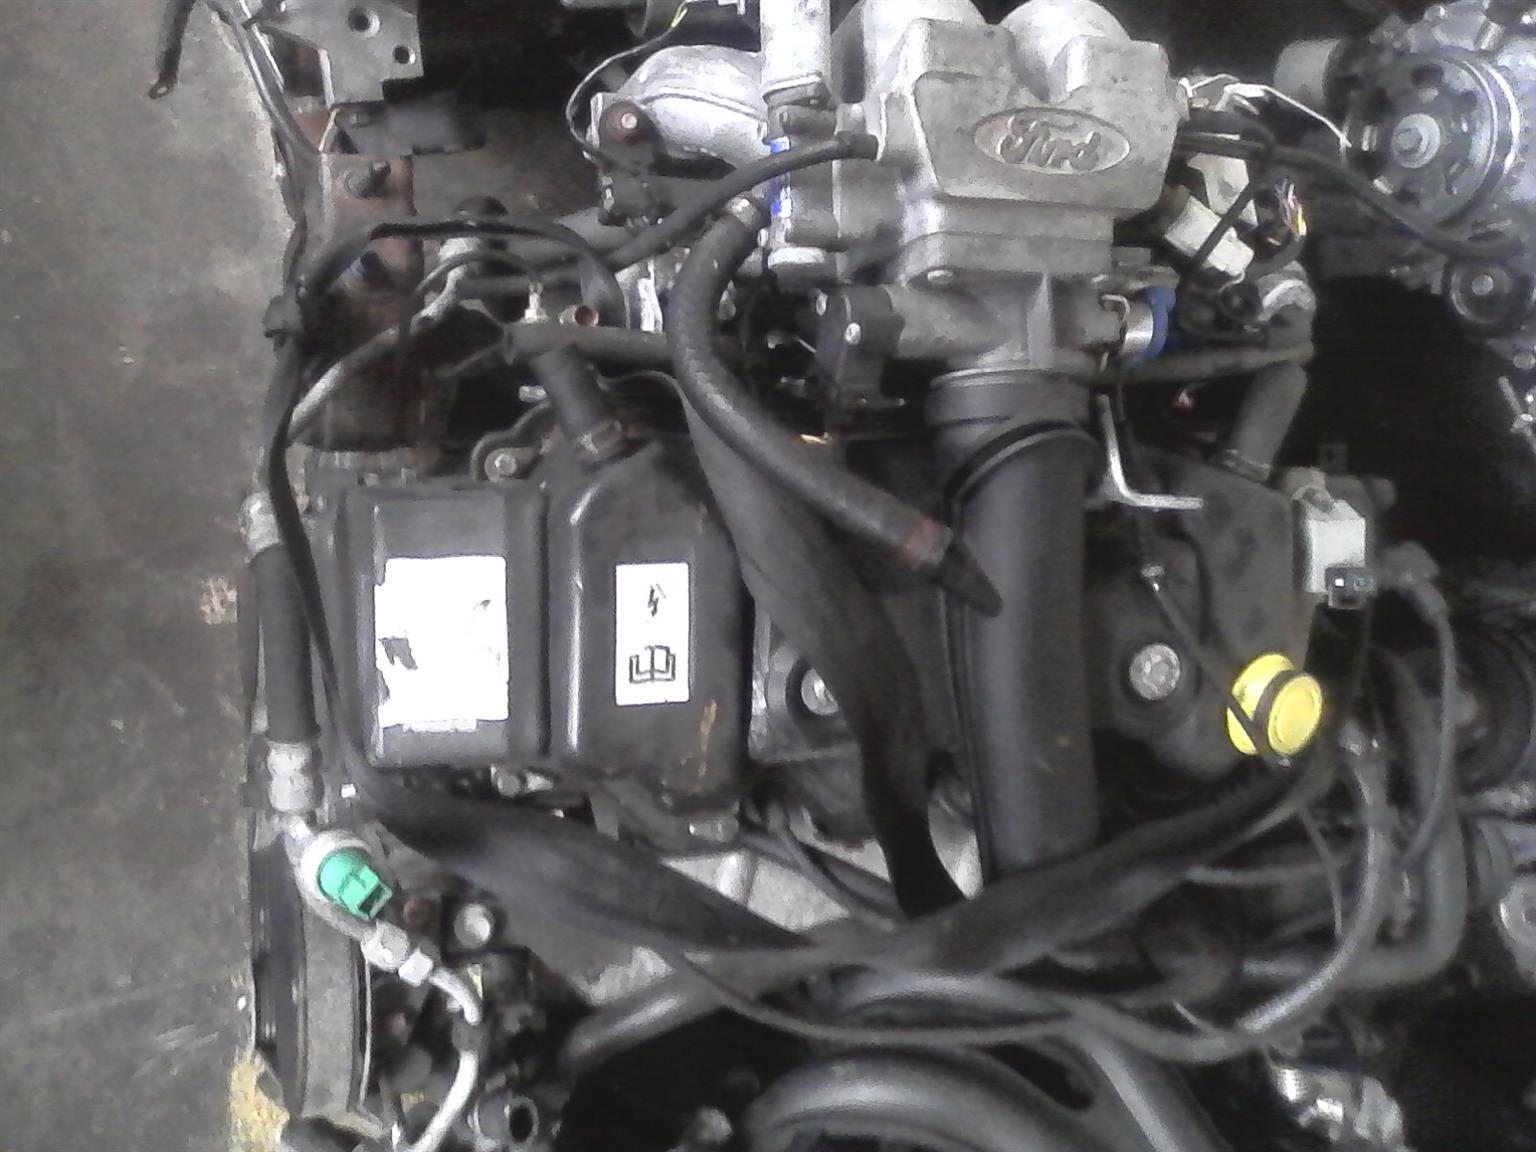 Ford Fiesta Endura 1.6 Engine for Sale